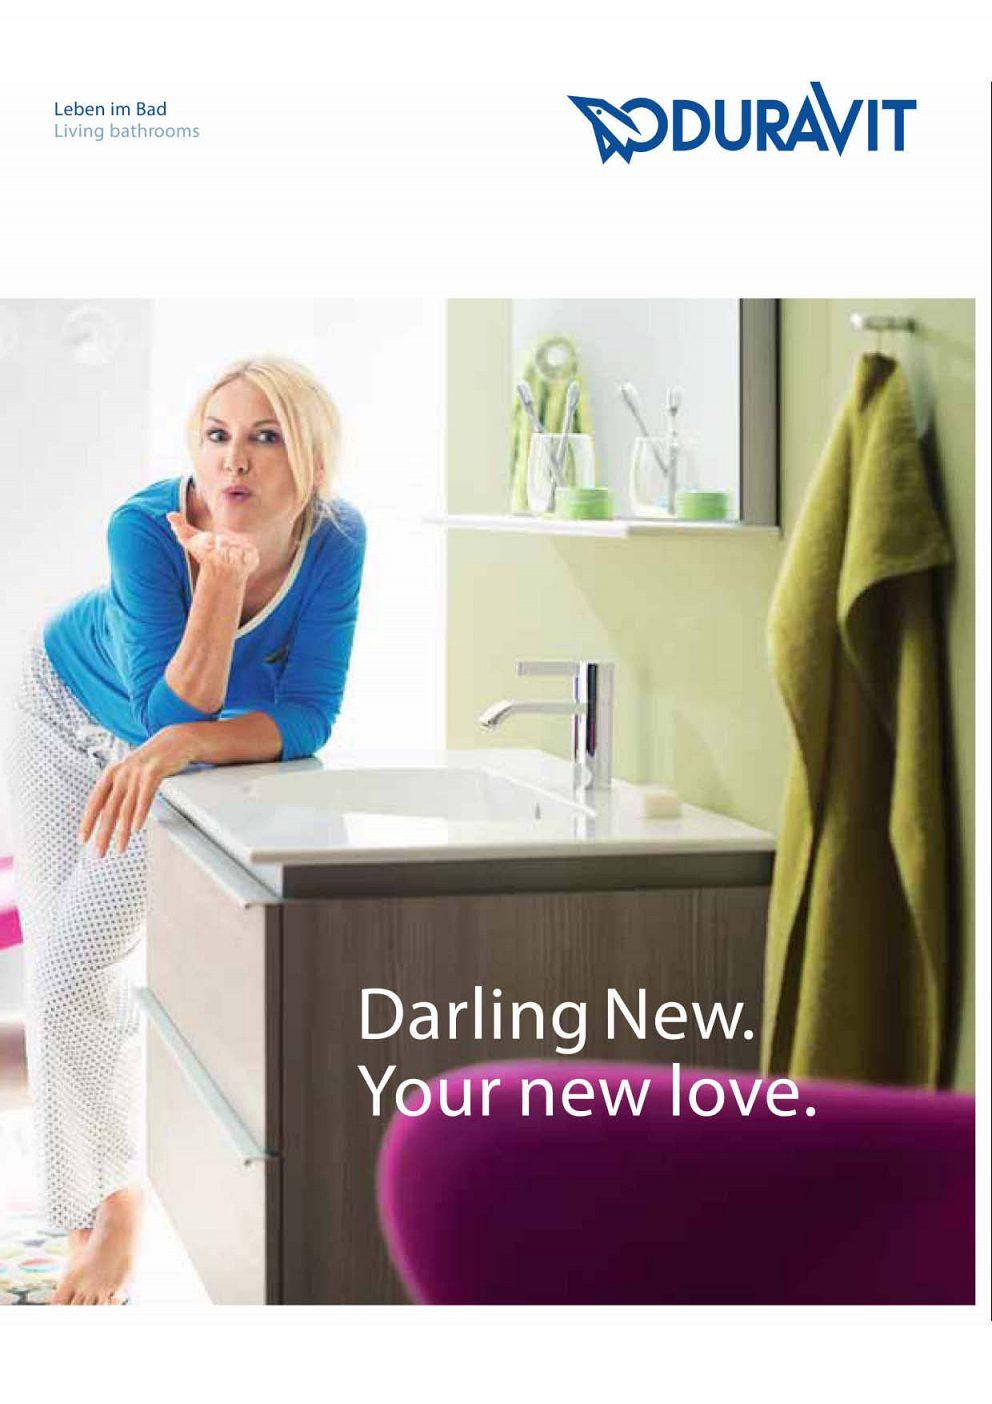 Duravit - Darling New